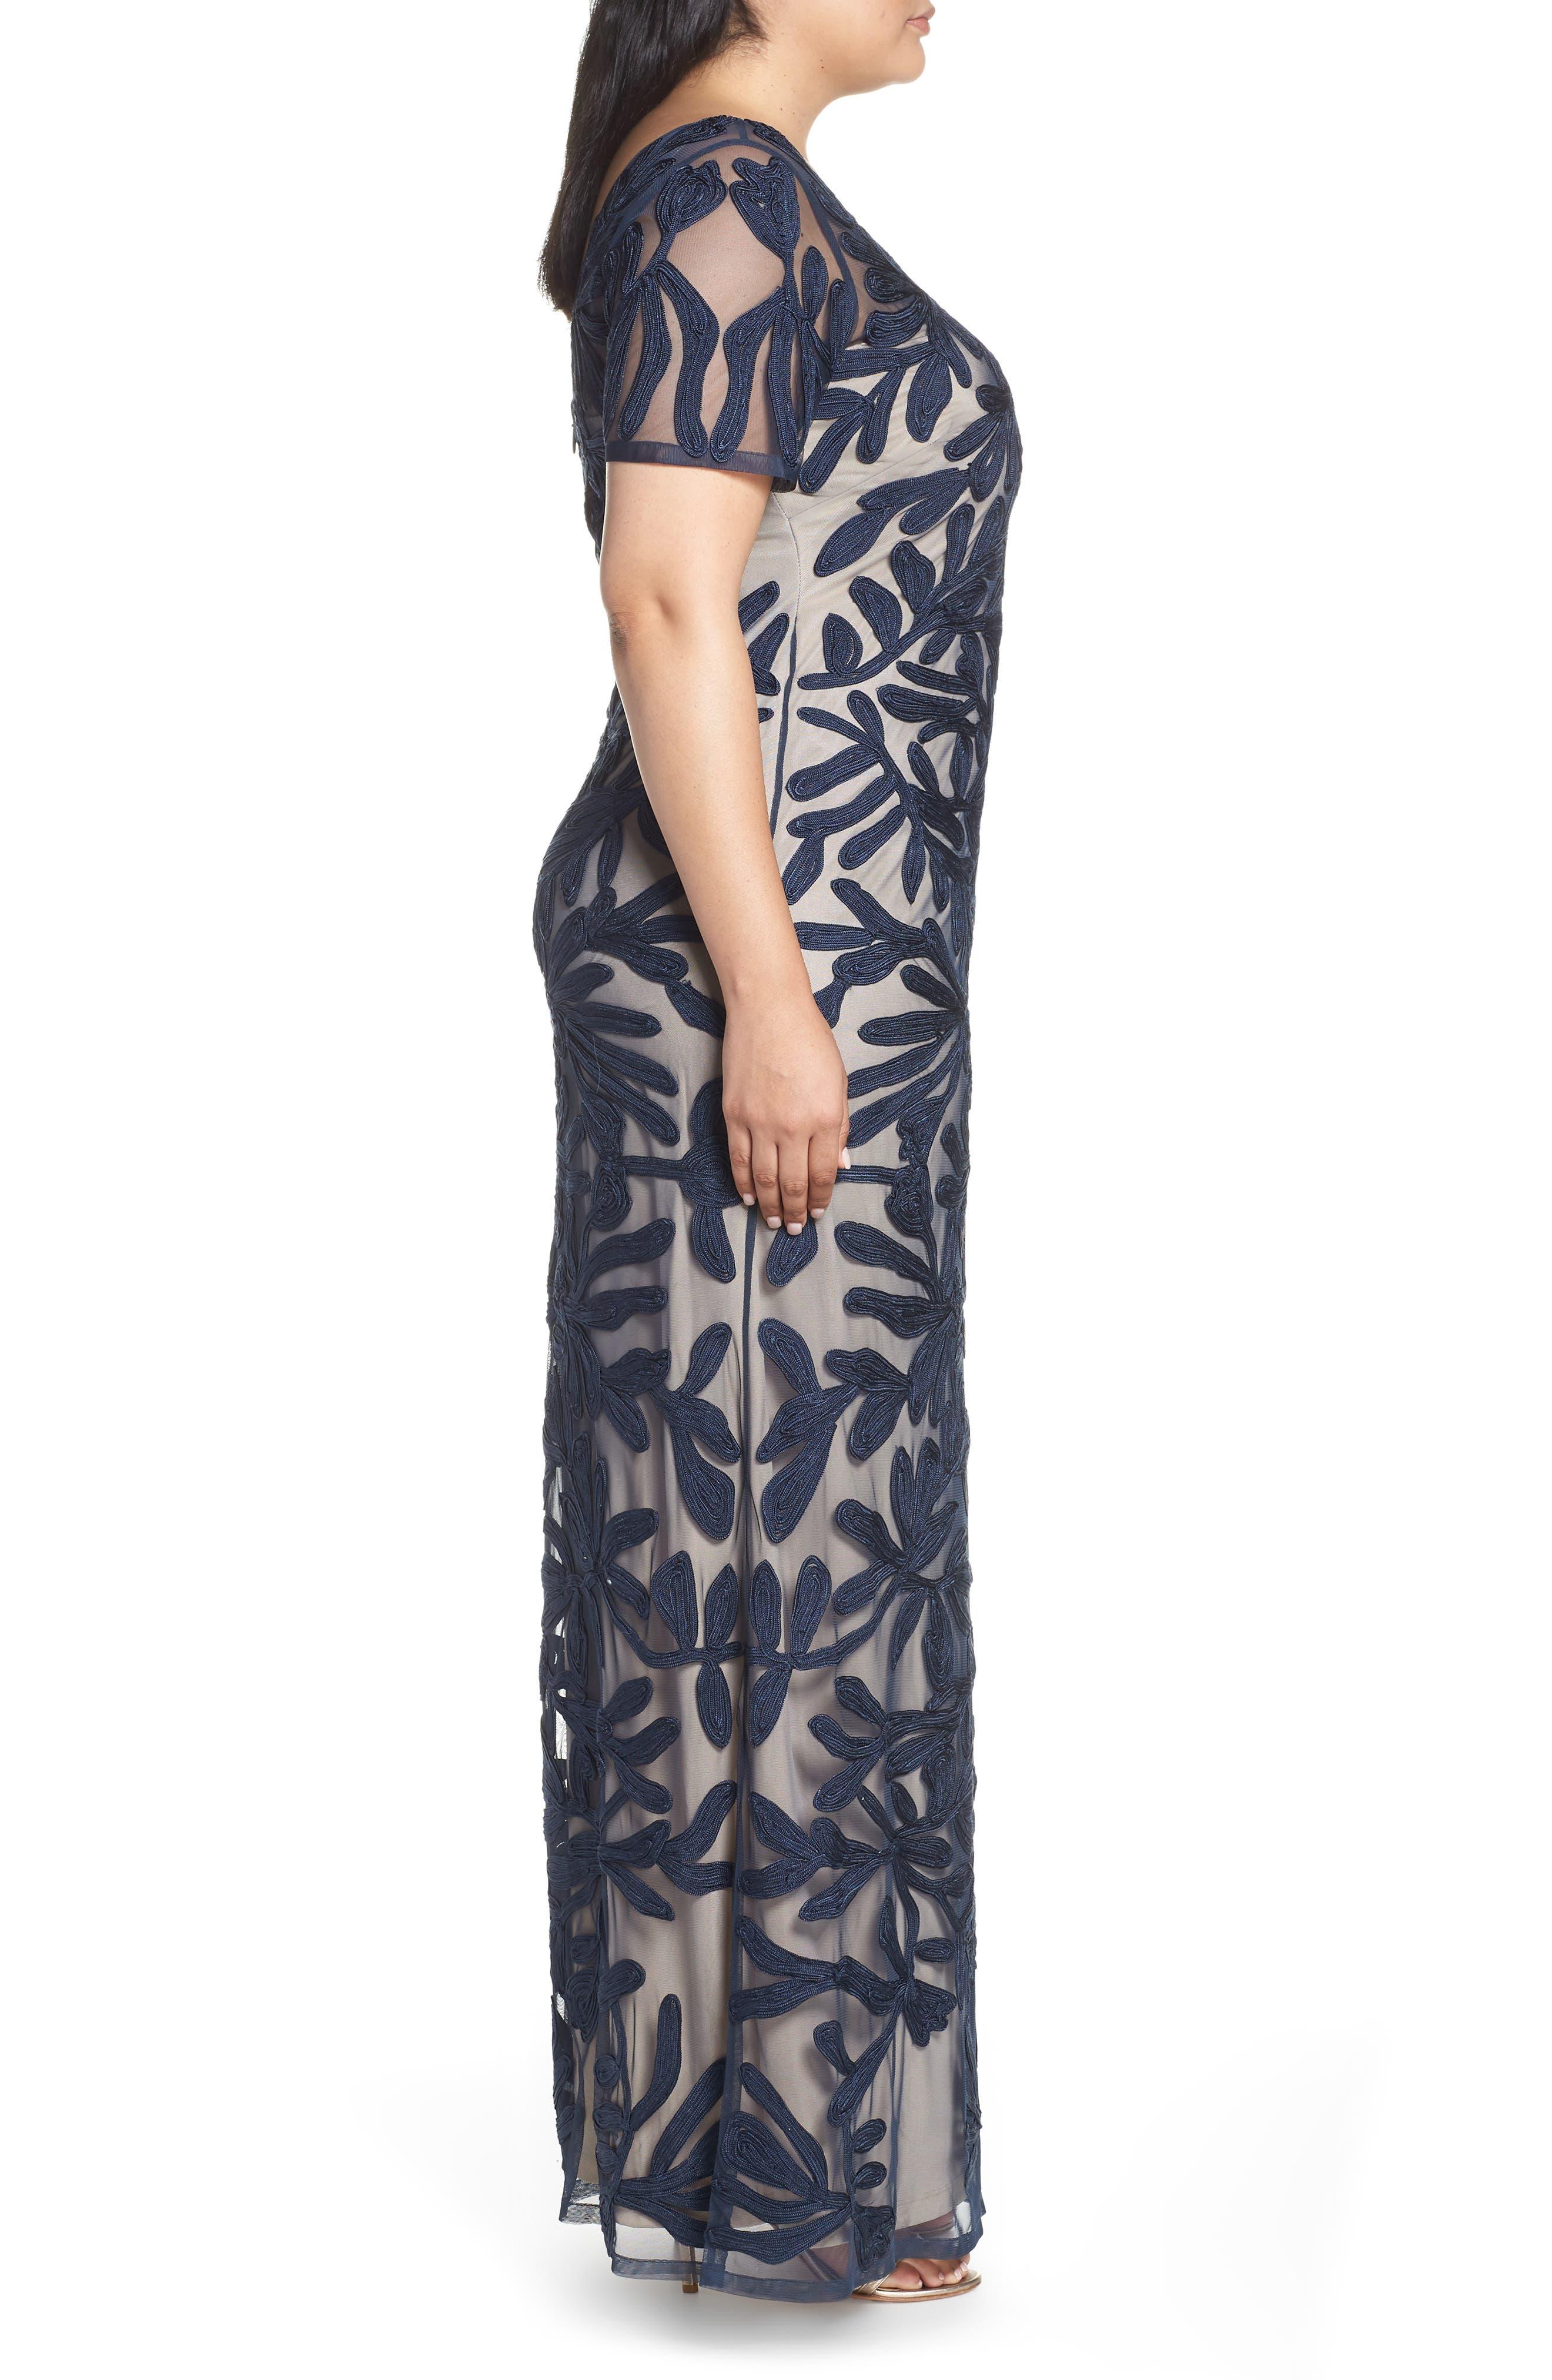 JS COLLECTIONS,                             Illusion Soutache Evening Dress,                             Alternate thumbnail 3, color,                             NAVY/ NUDE